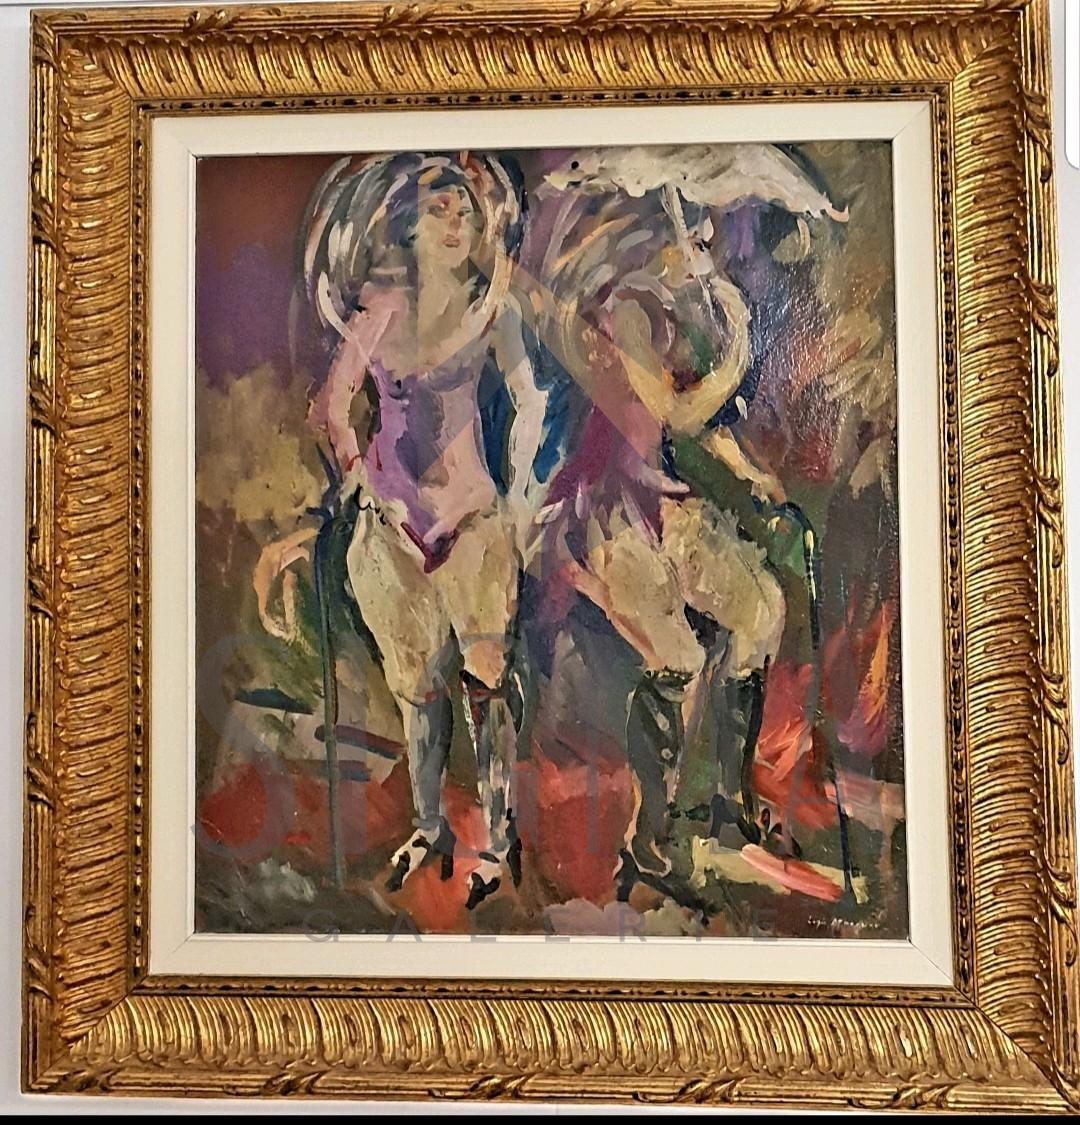 Tablou, Ligia Macovei, La cabaret, ulei pe carton, dim: 64,5 x 55 cm, semnat dreapta jos cu alb